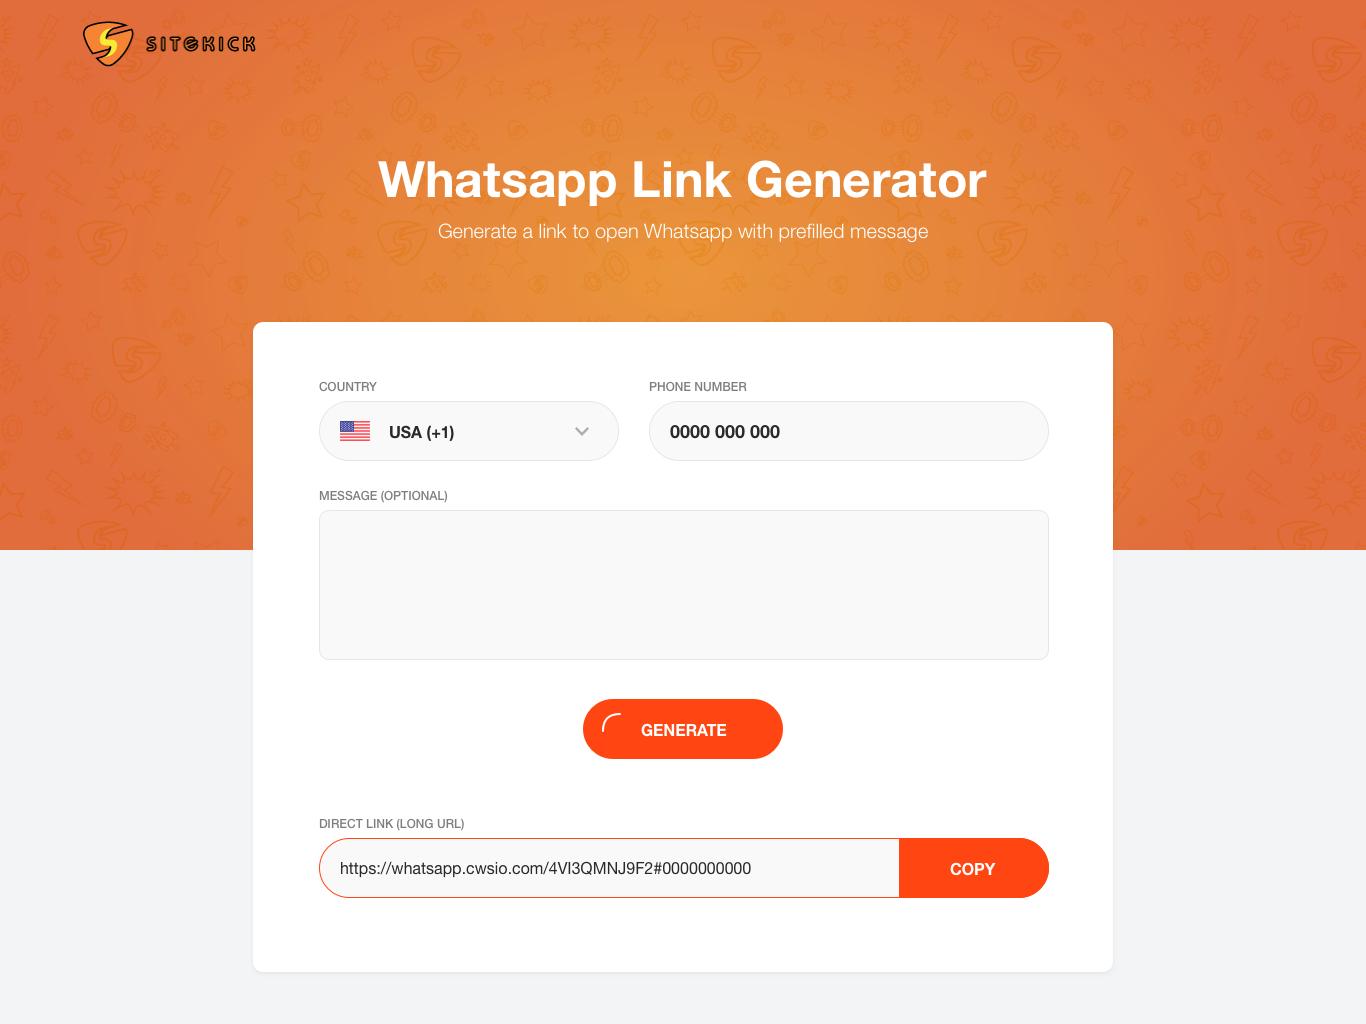 Whatsapp link generator by ziropixel on Dribbble